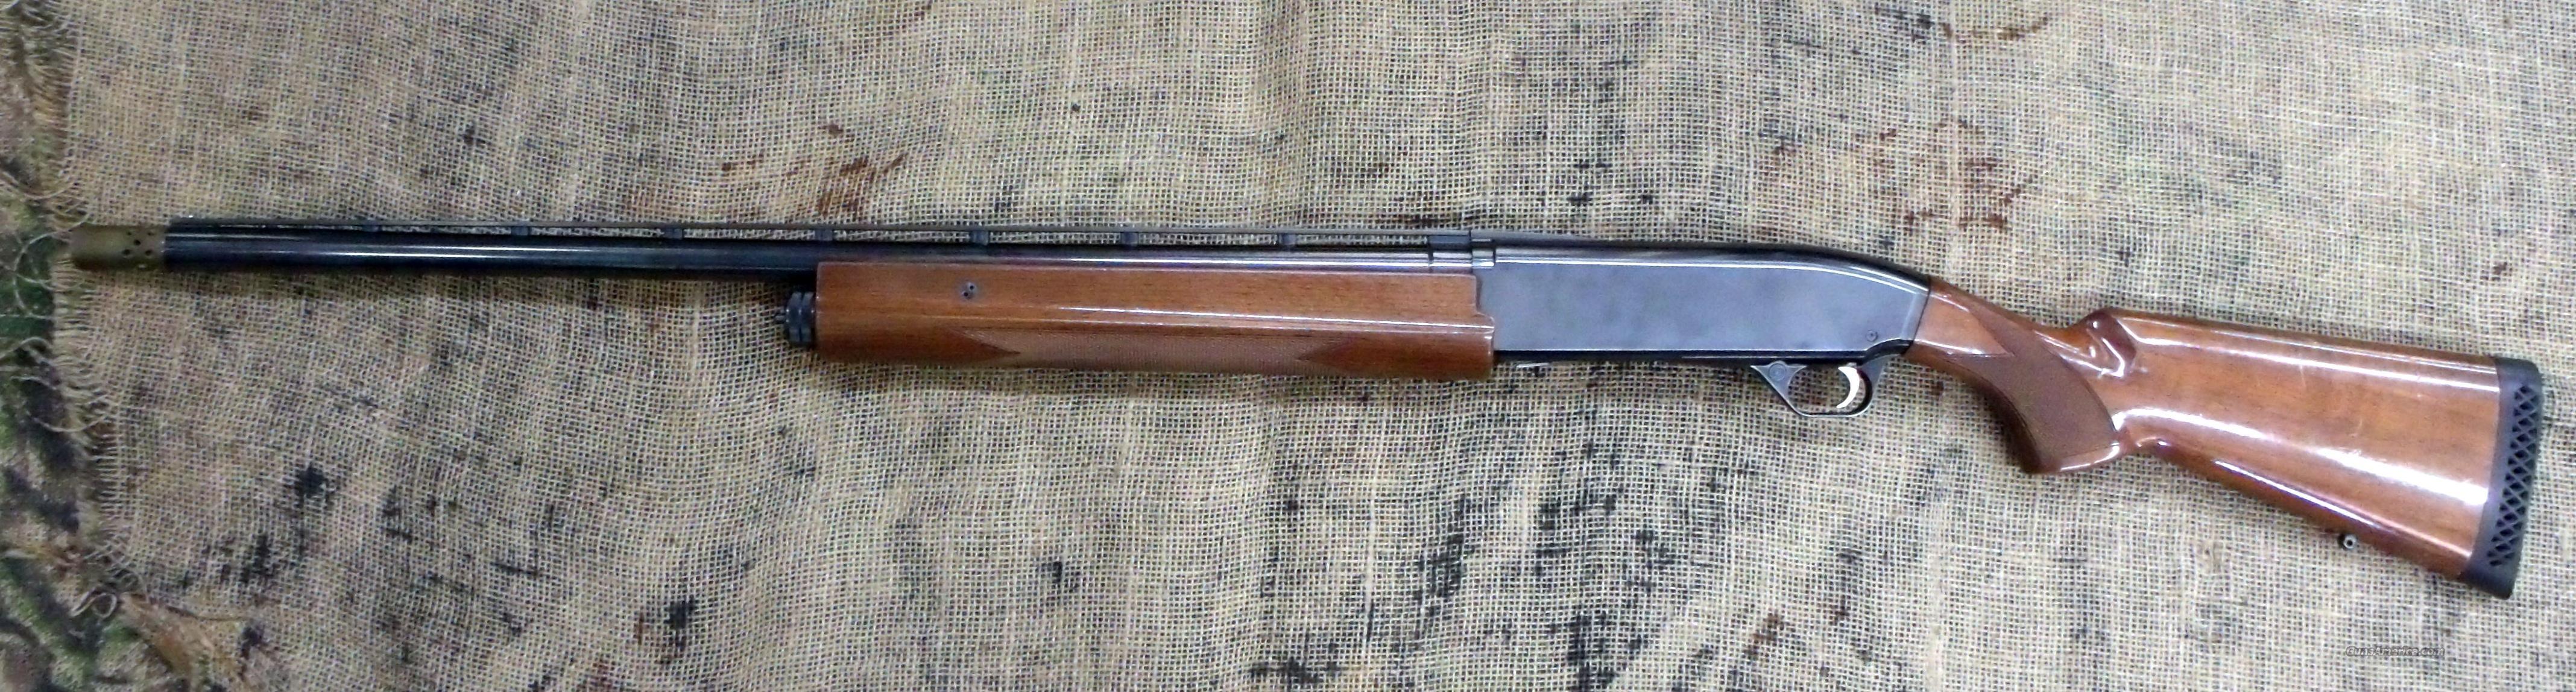 BROWNING Gold 10 Hunter Shotgun, 10 Ga  Guns > Shotguns > Browning Shotguns > Autoloaders > Hunting